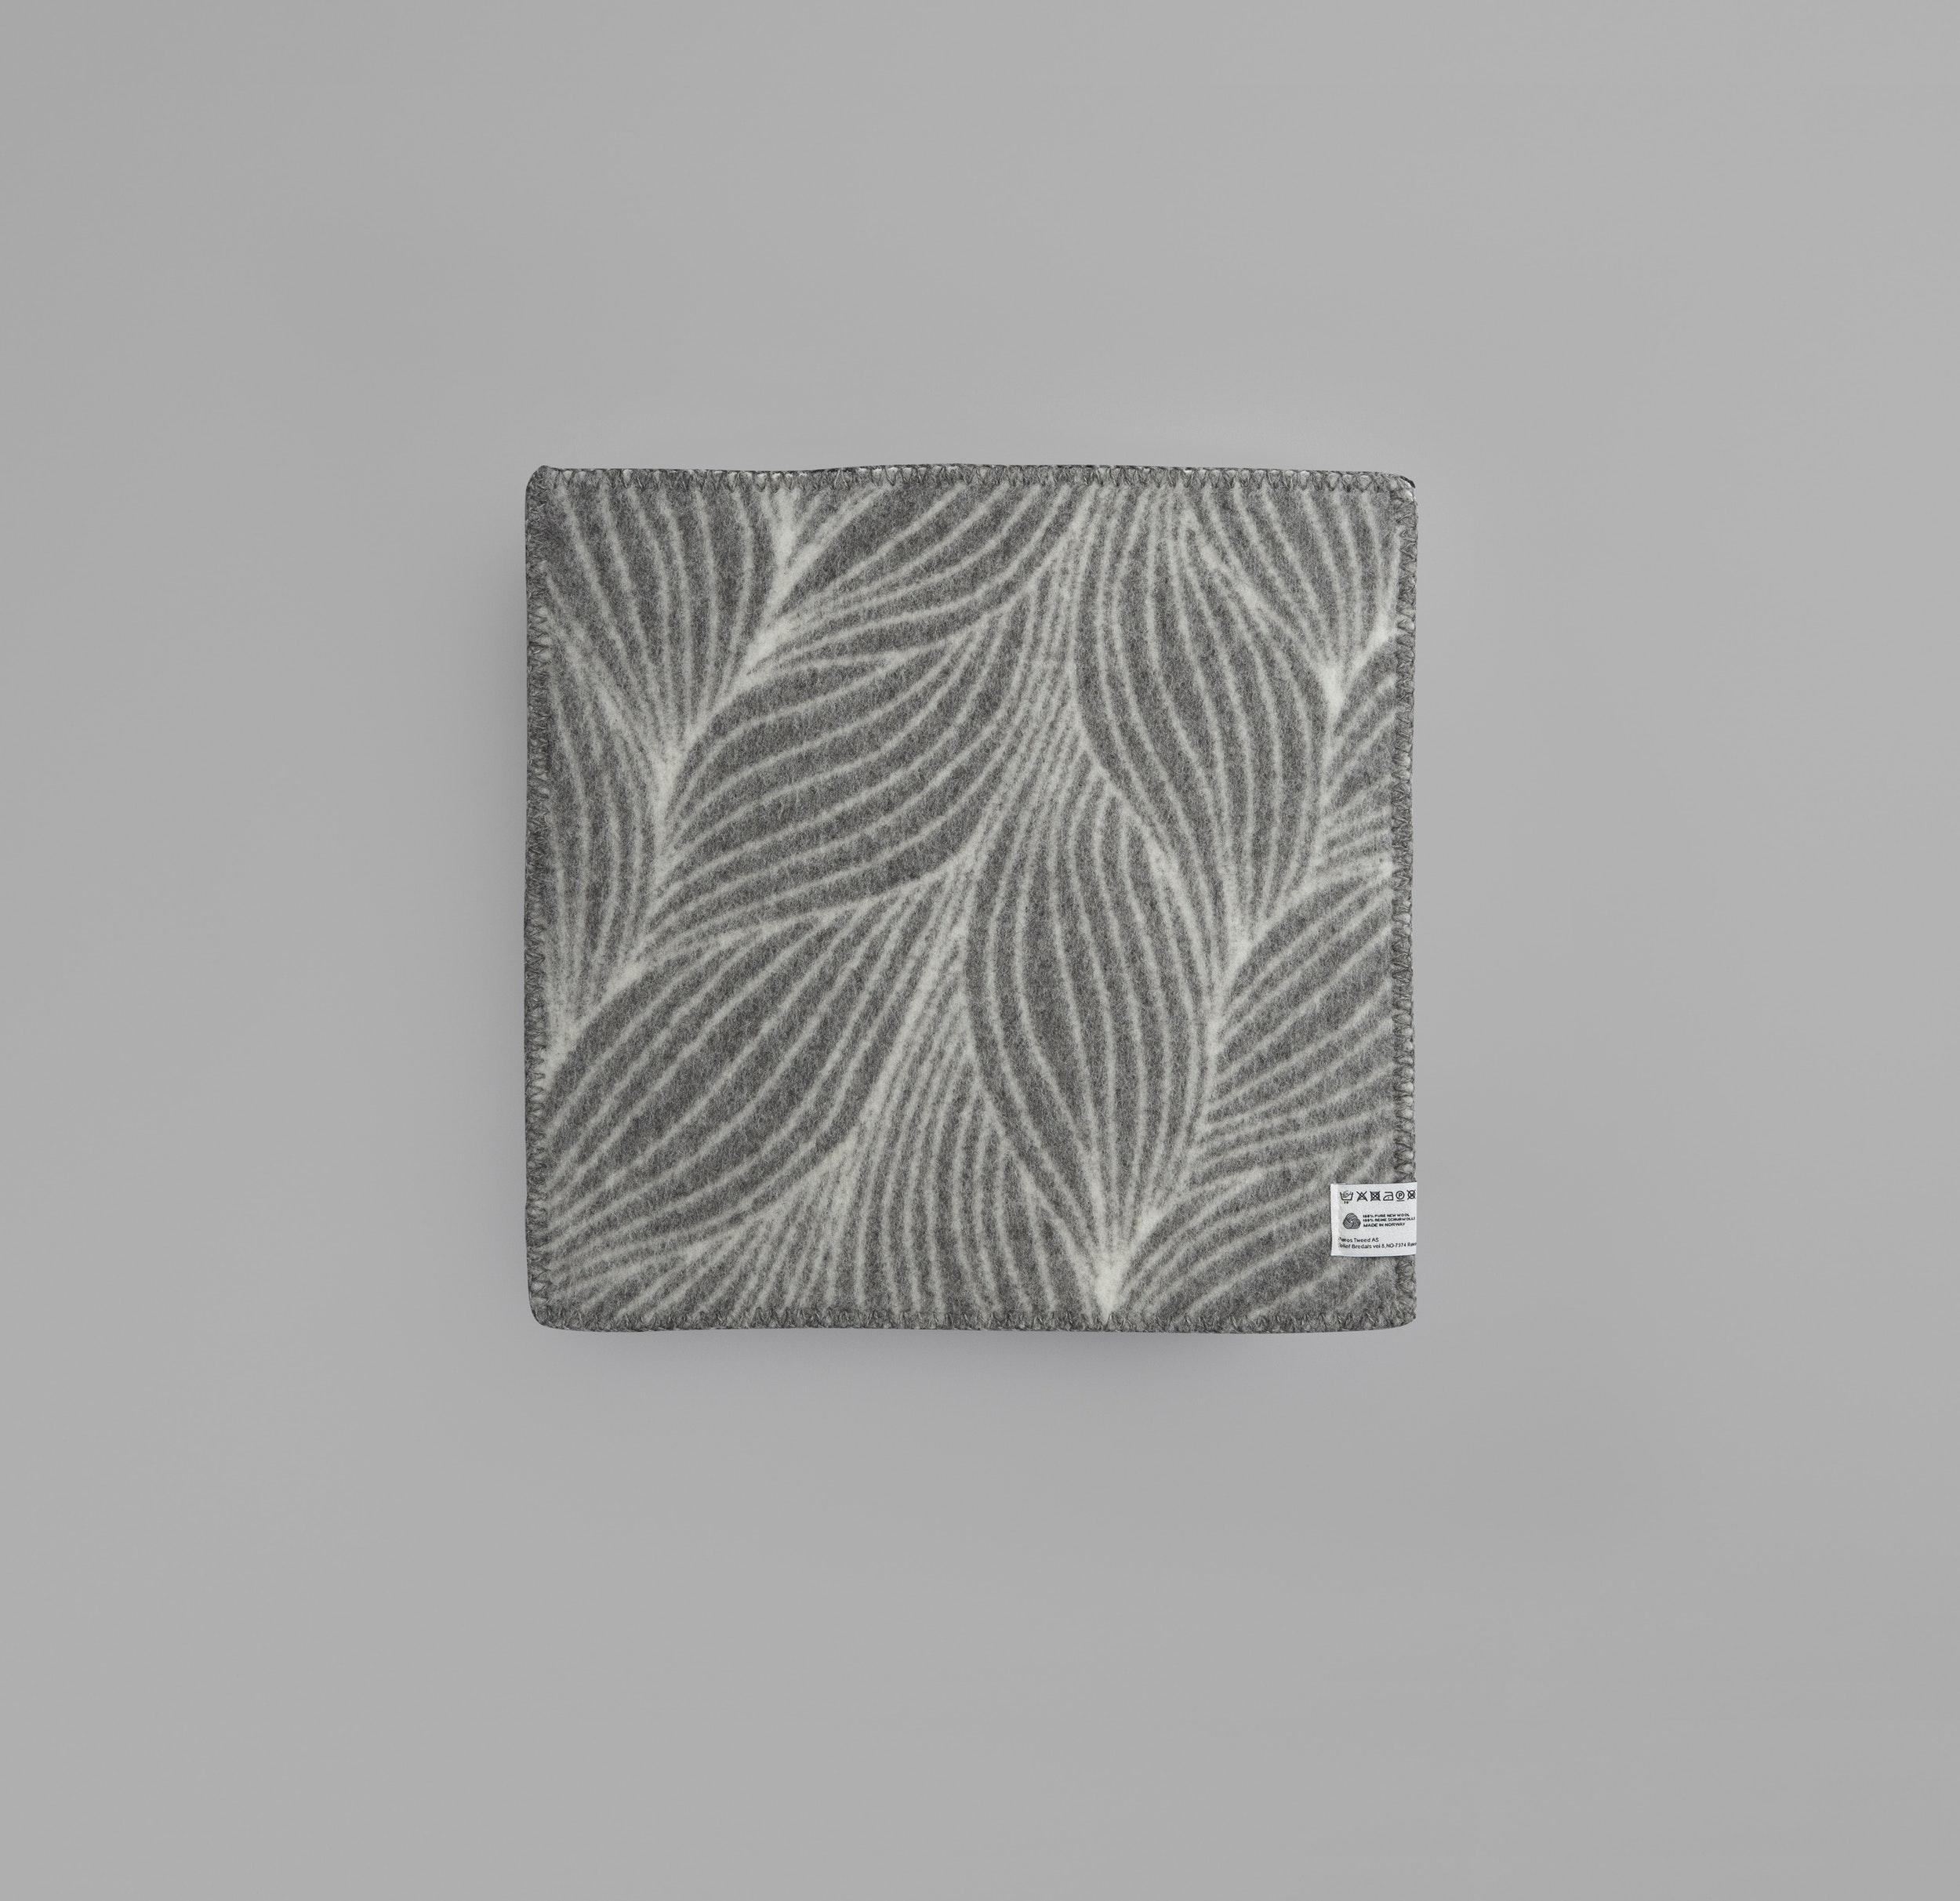 Røros Tweed - Flette Sitteunderlag